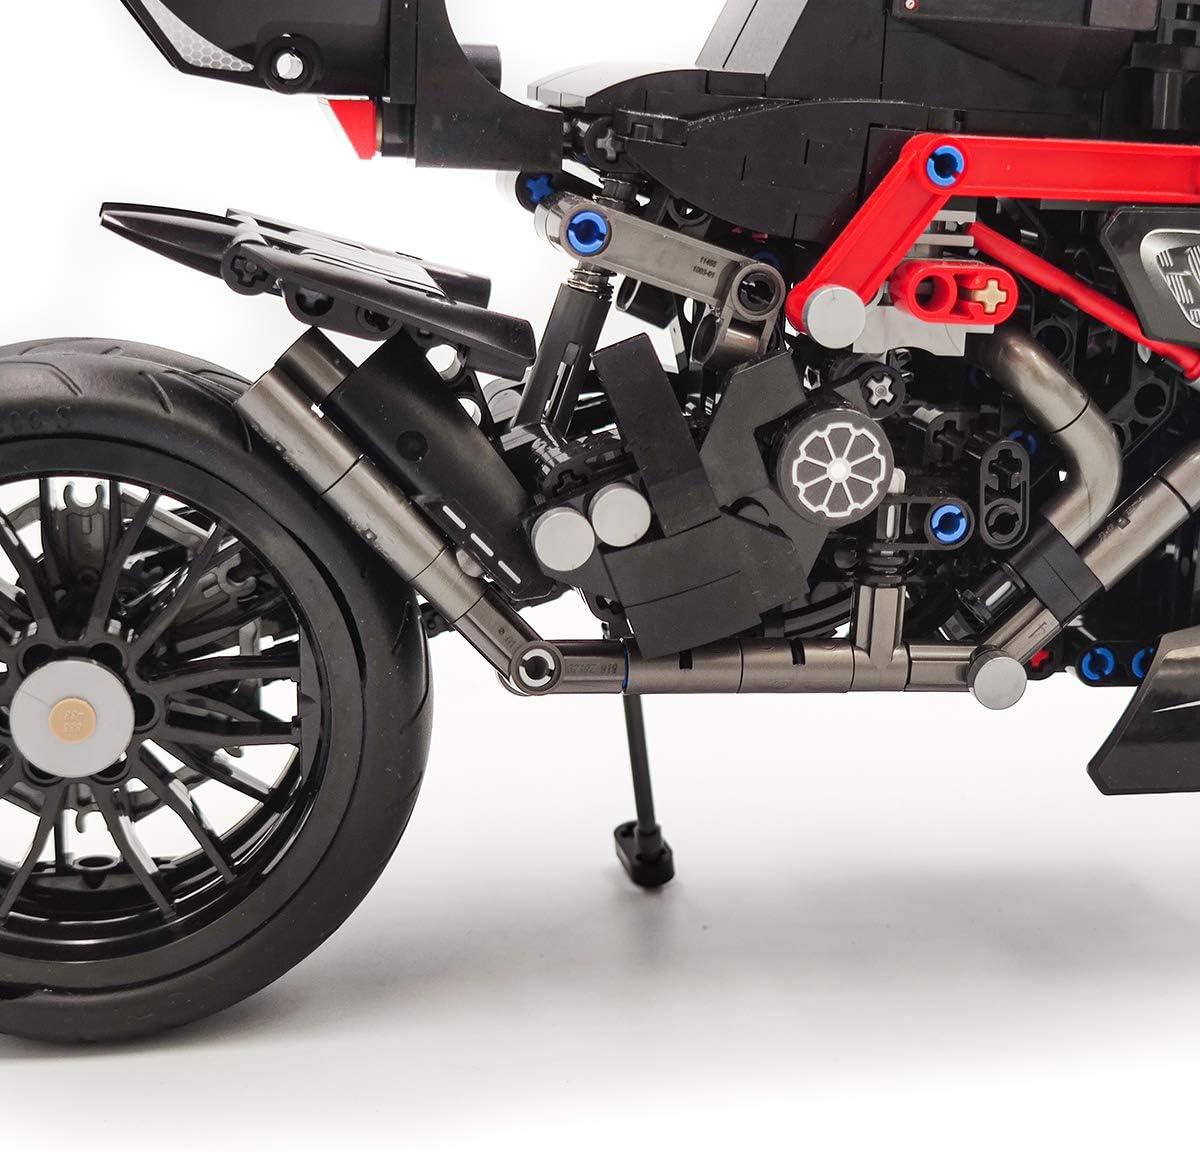 dOvOb Creator Expert Black Super Cross-Country Motorcycle Set,Adult Car Model,Building Blocks 702 PCS